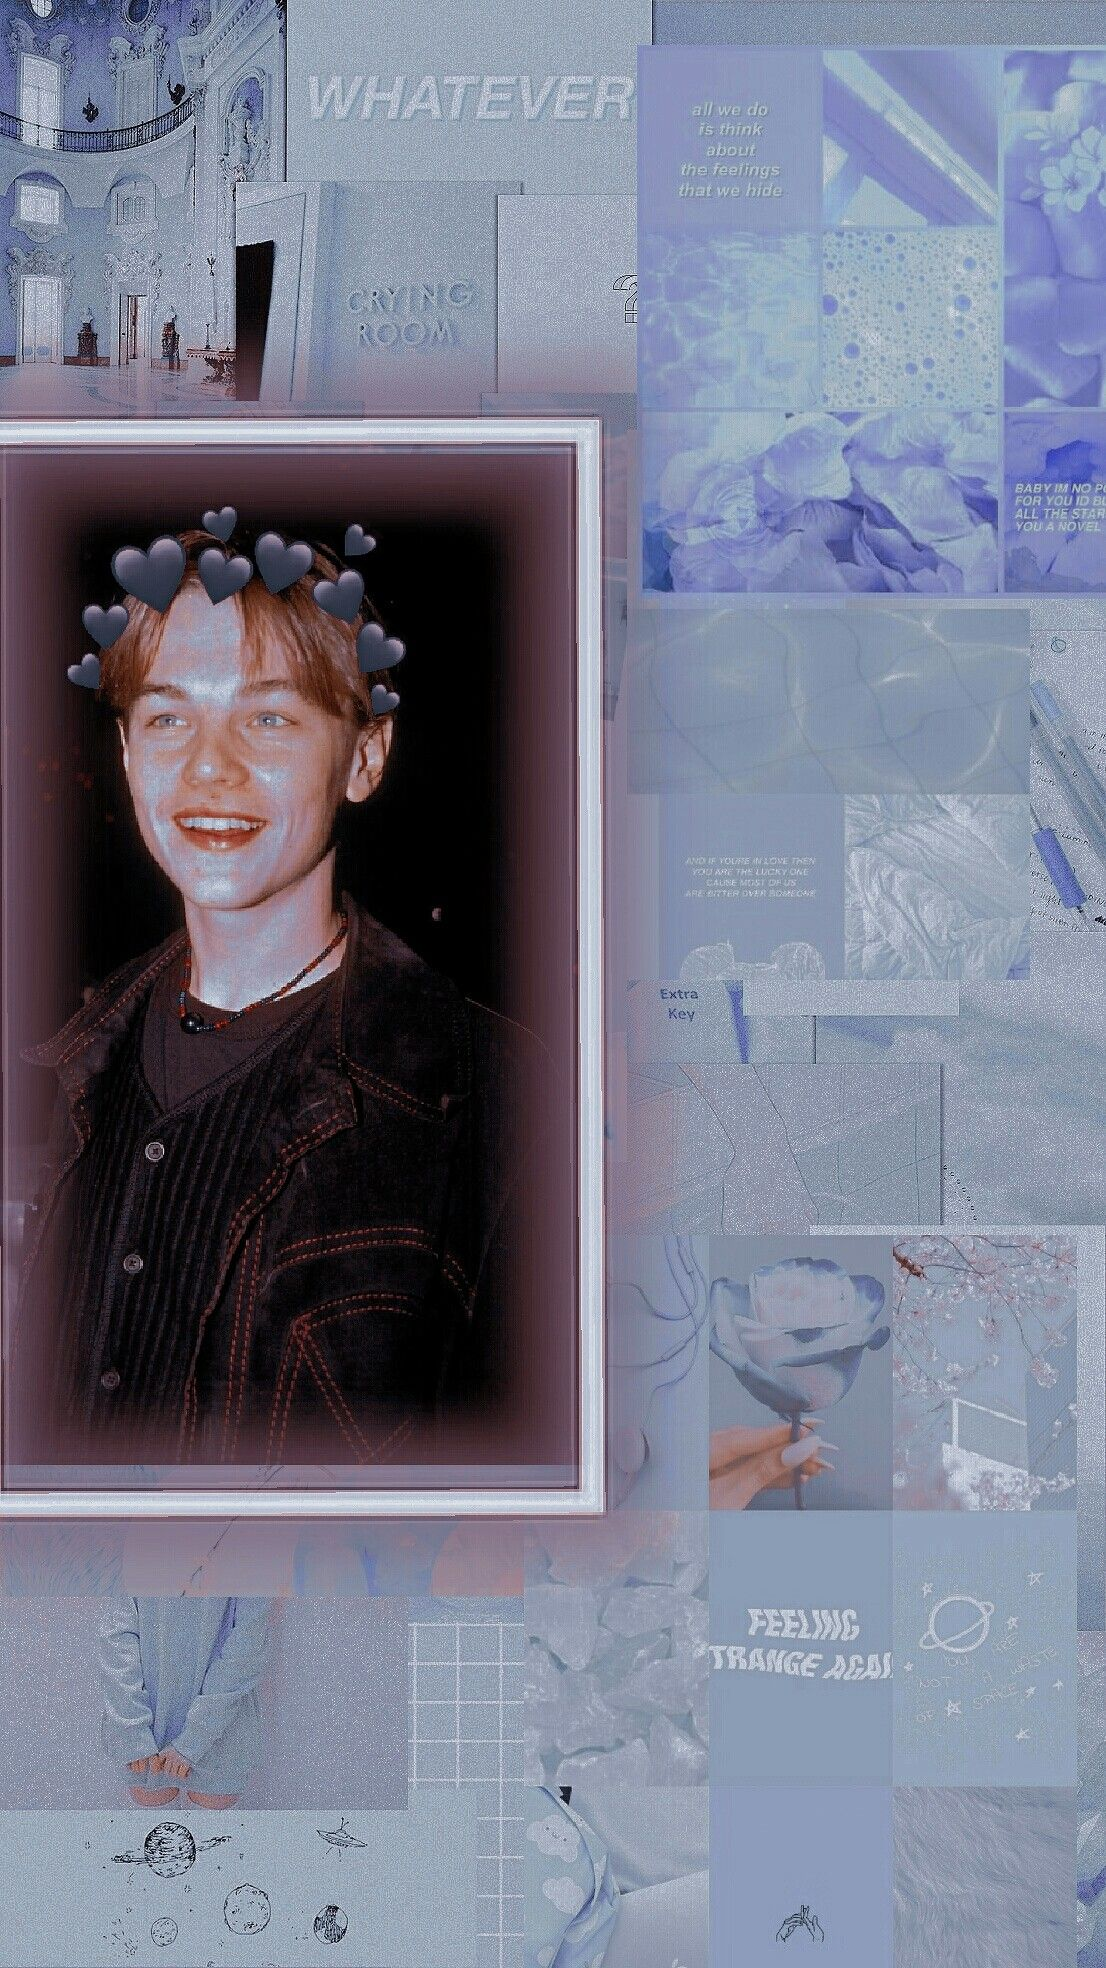 Young Leonardo Dicaprio Aesthetic Wallpaper